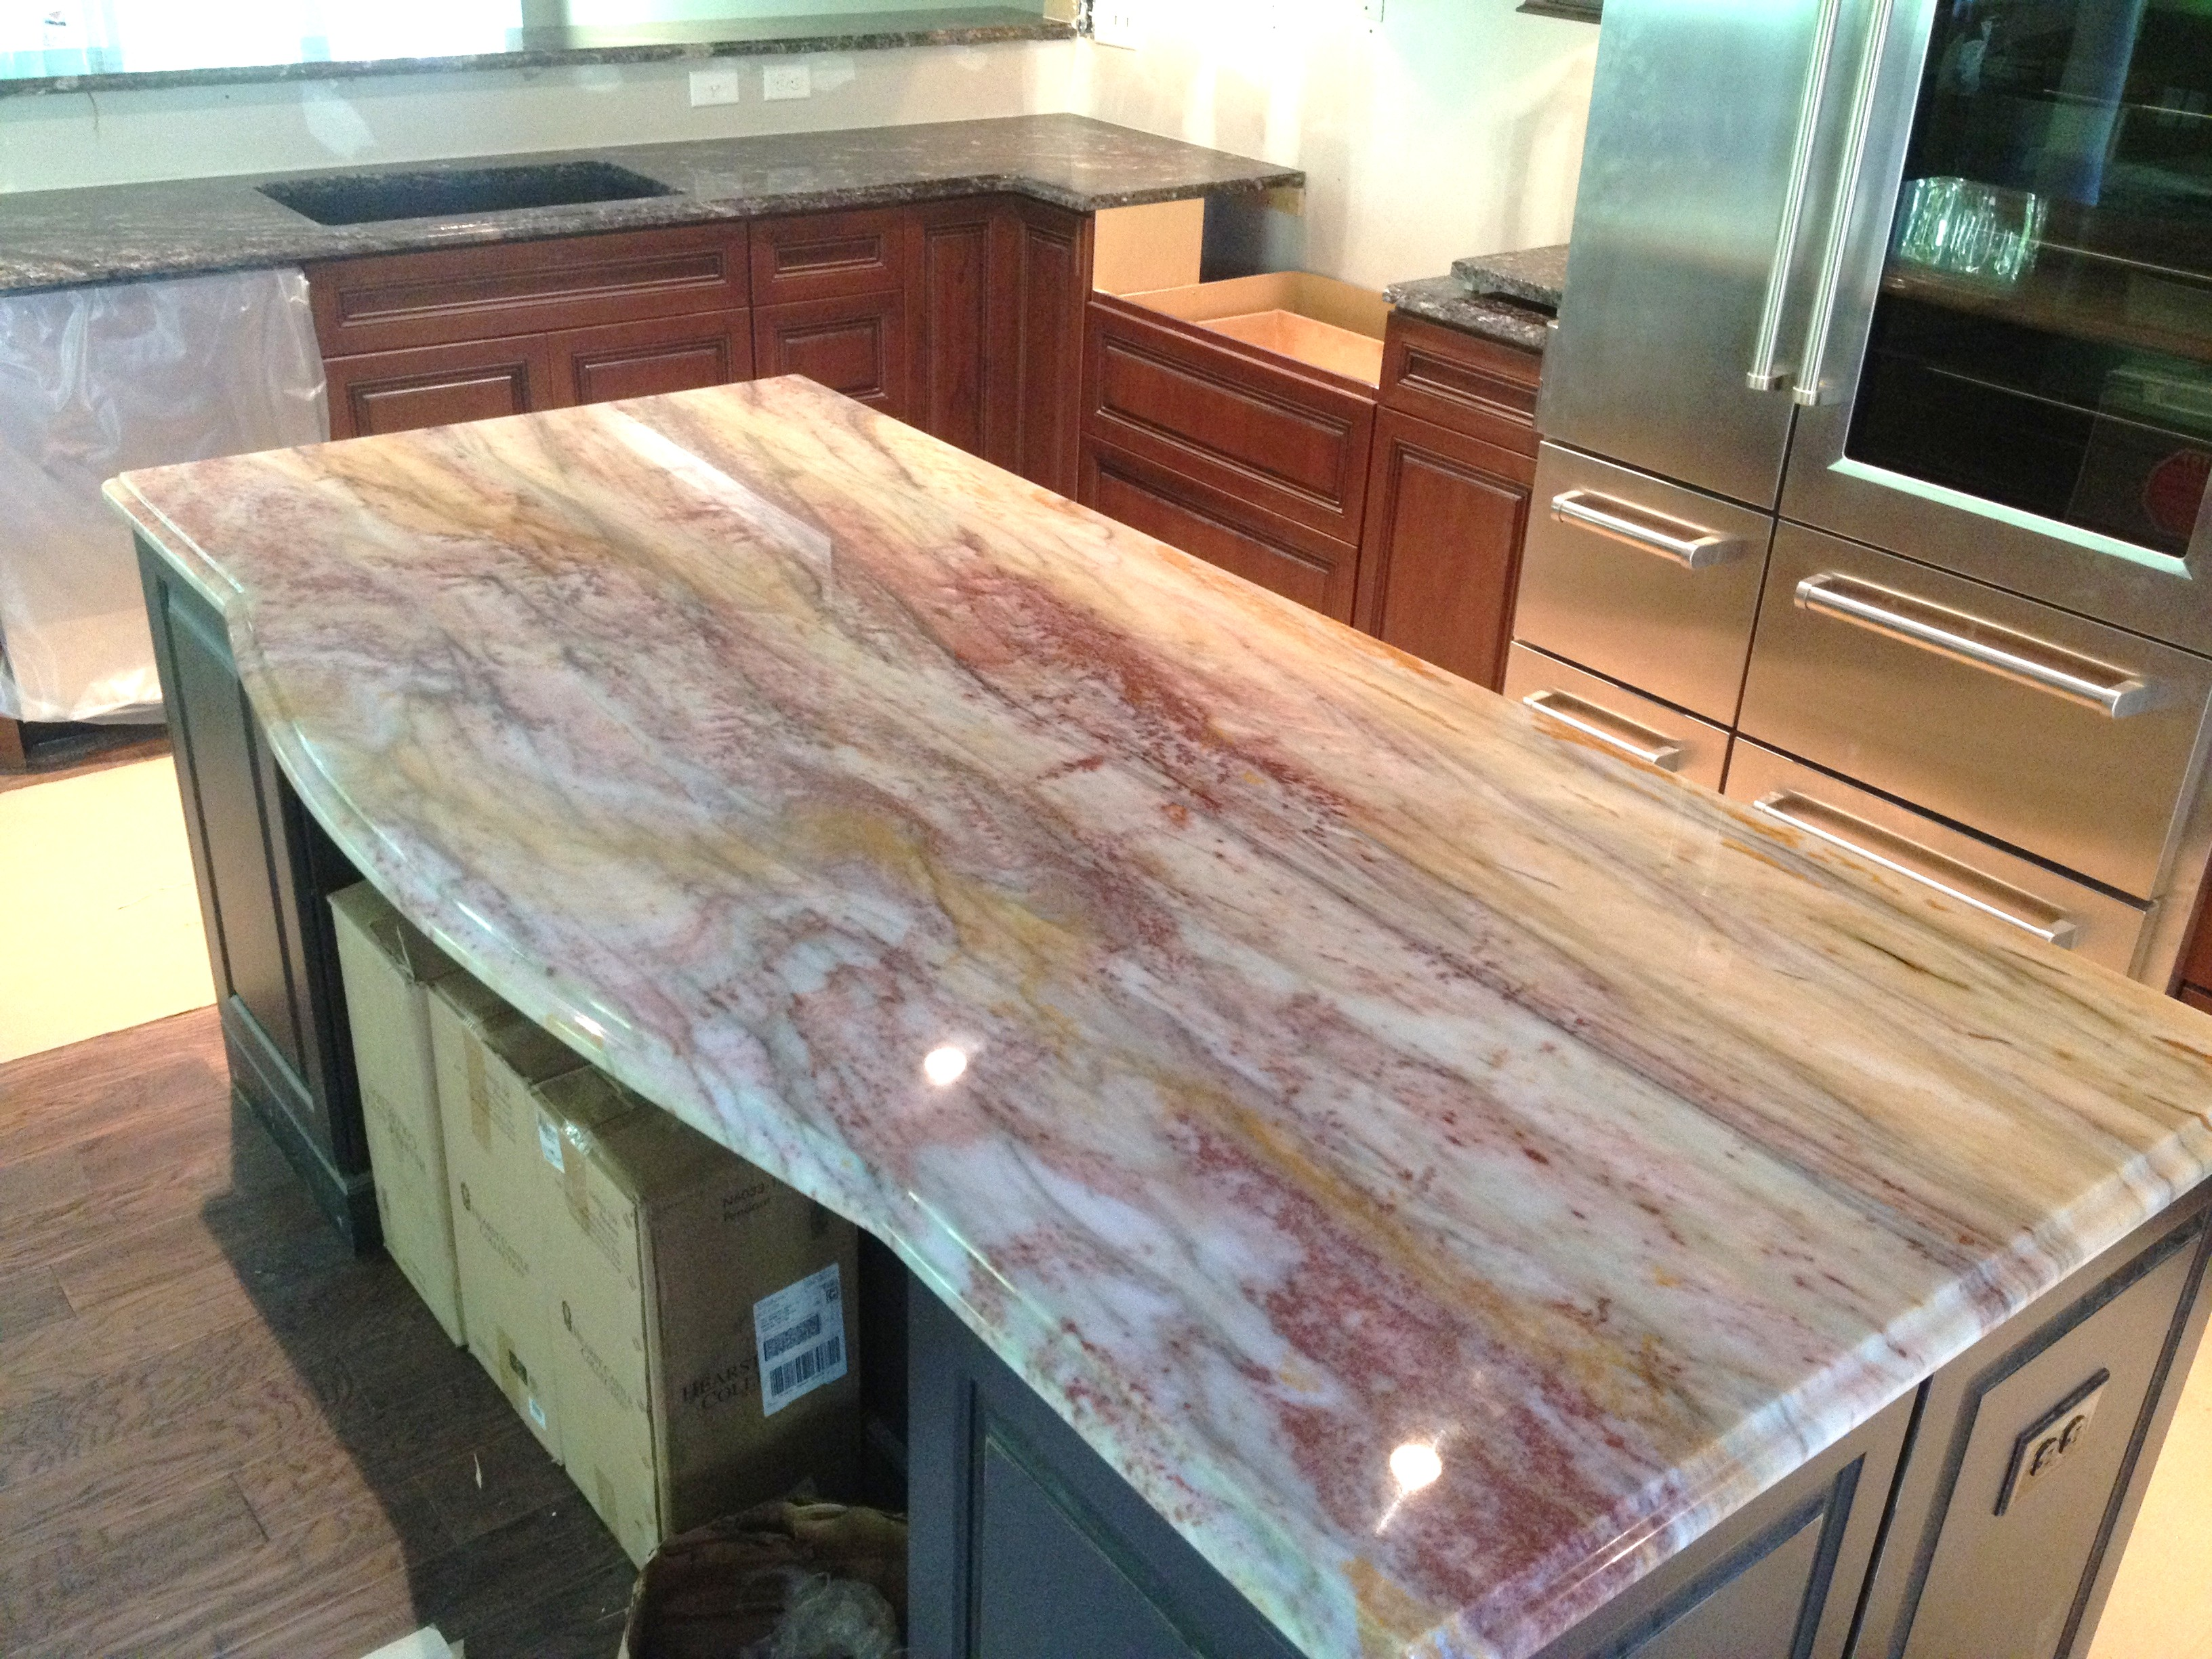 countertops crema designs milwaukee shop bar tops kitchen river caramel countertop granite white counter off